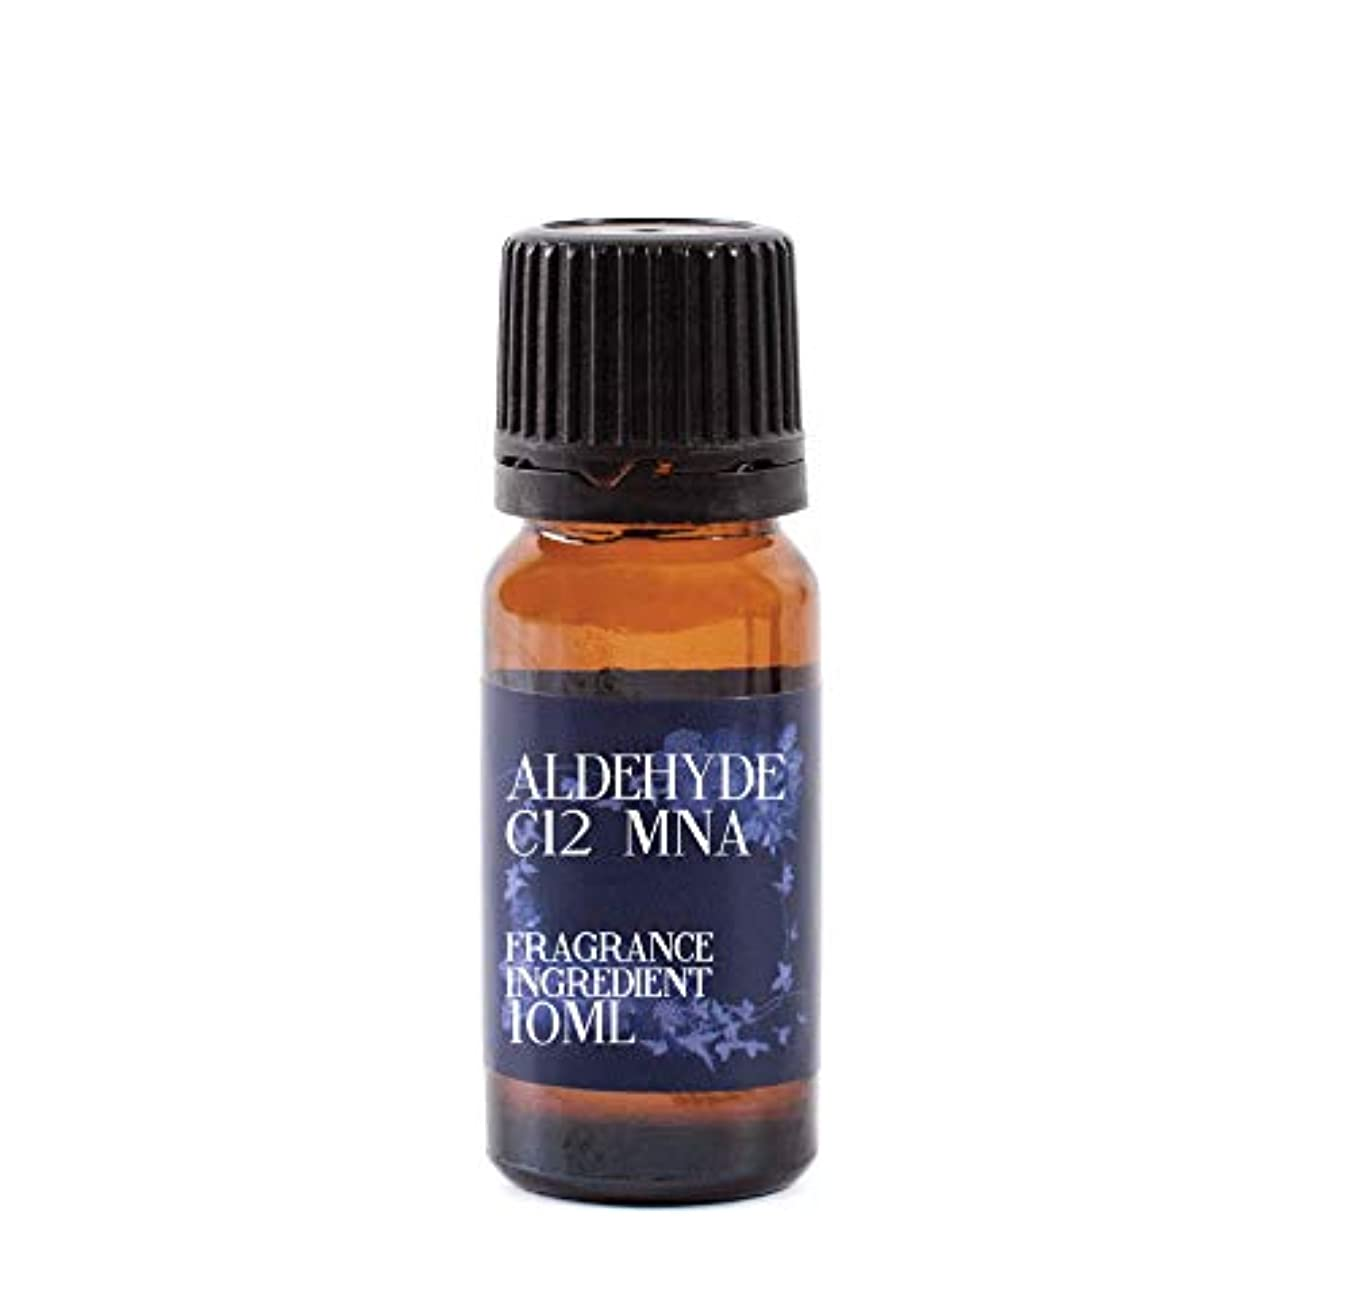 Mystic Moments | Aldehyde C12 MNA (2-Methylundecanal) - 10ml